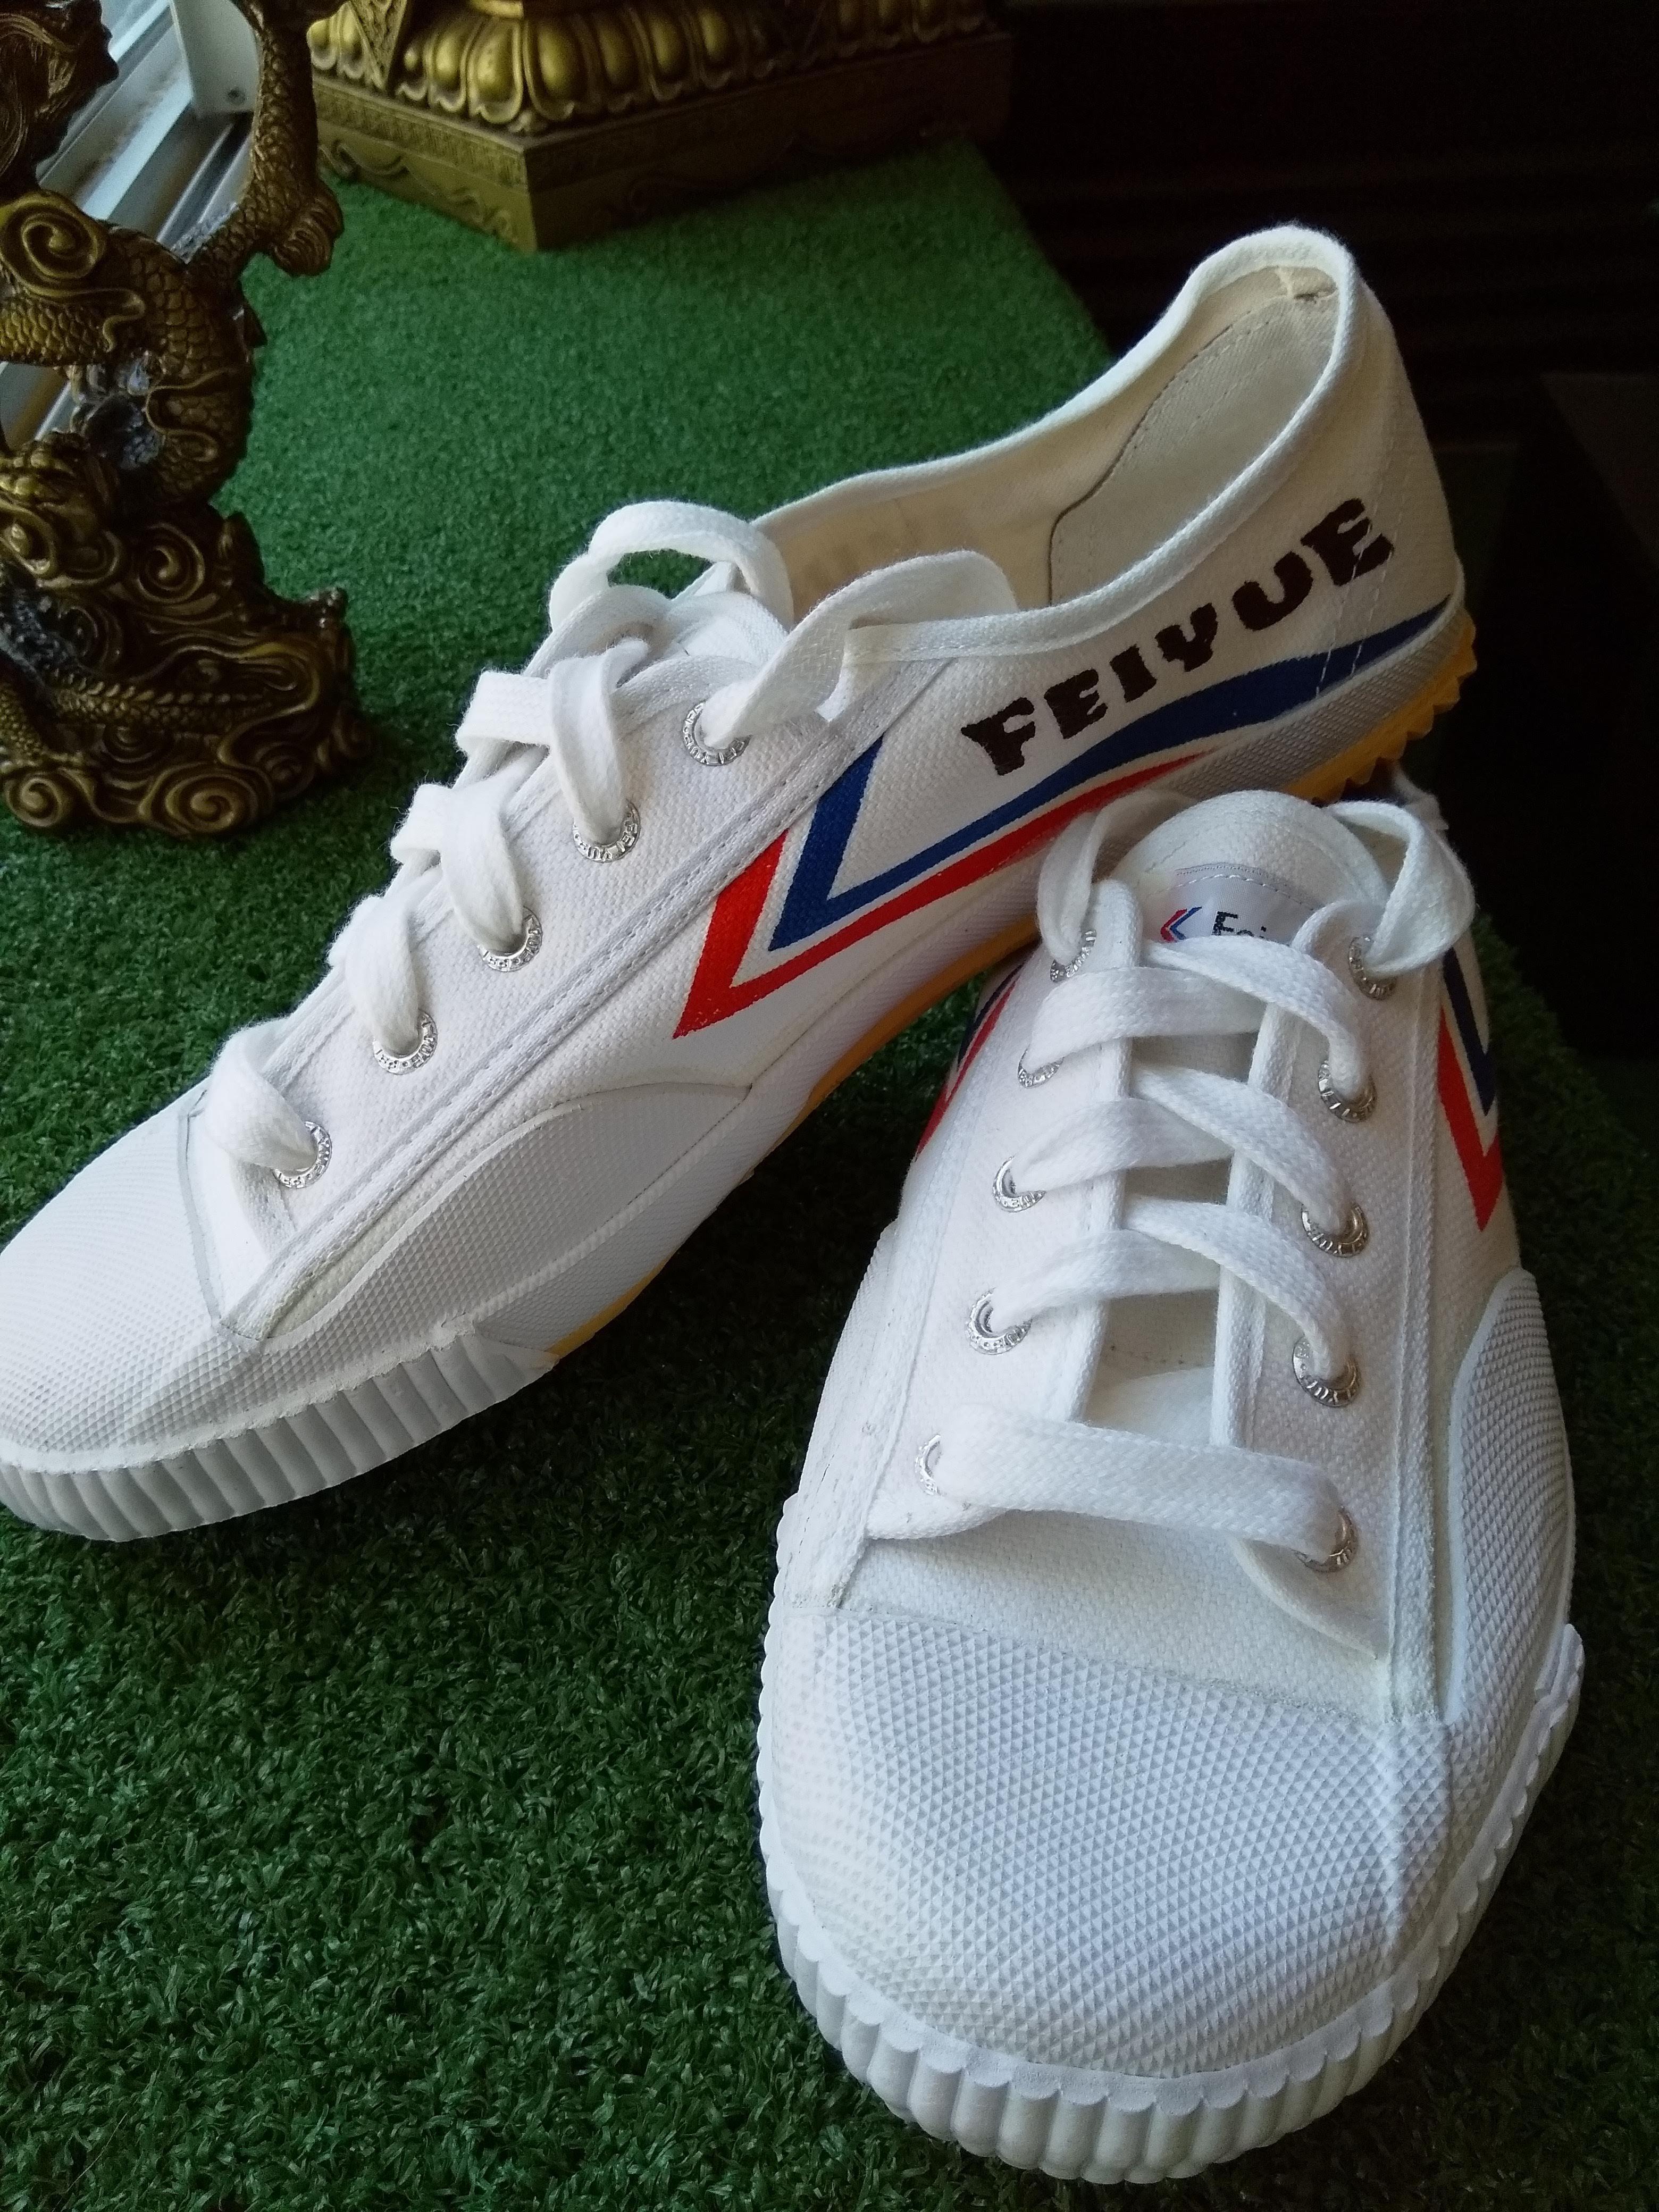 Feiyue Authentic Lo White